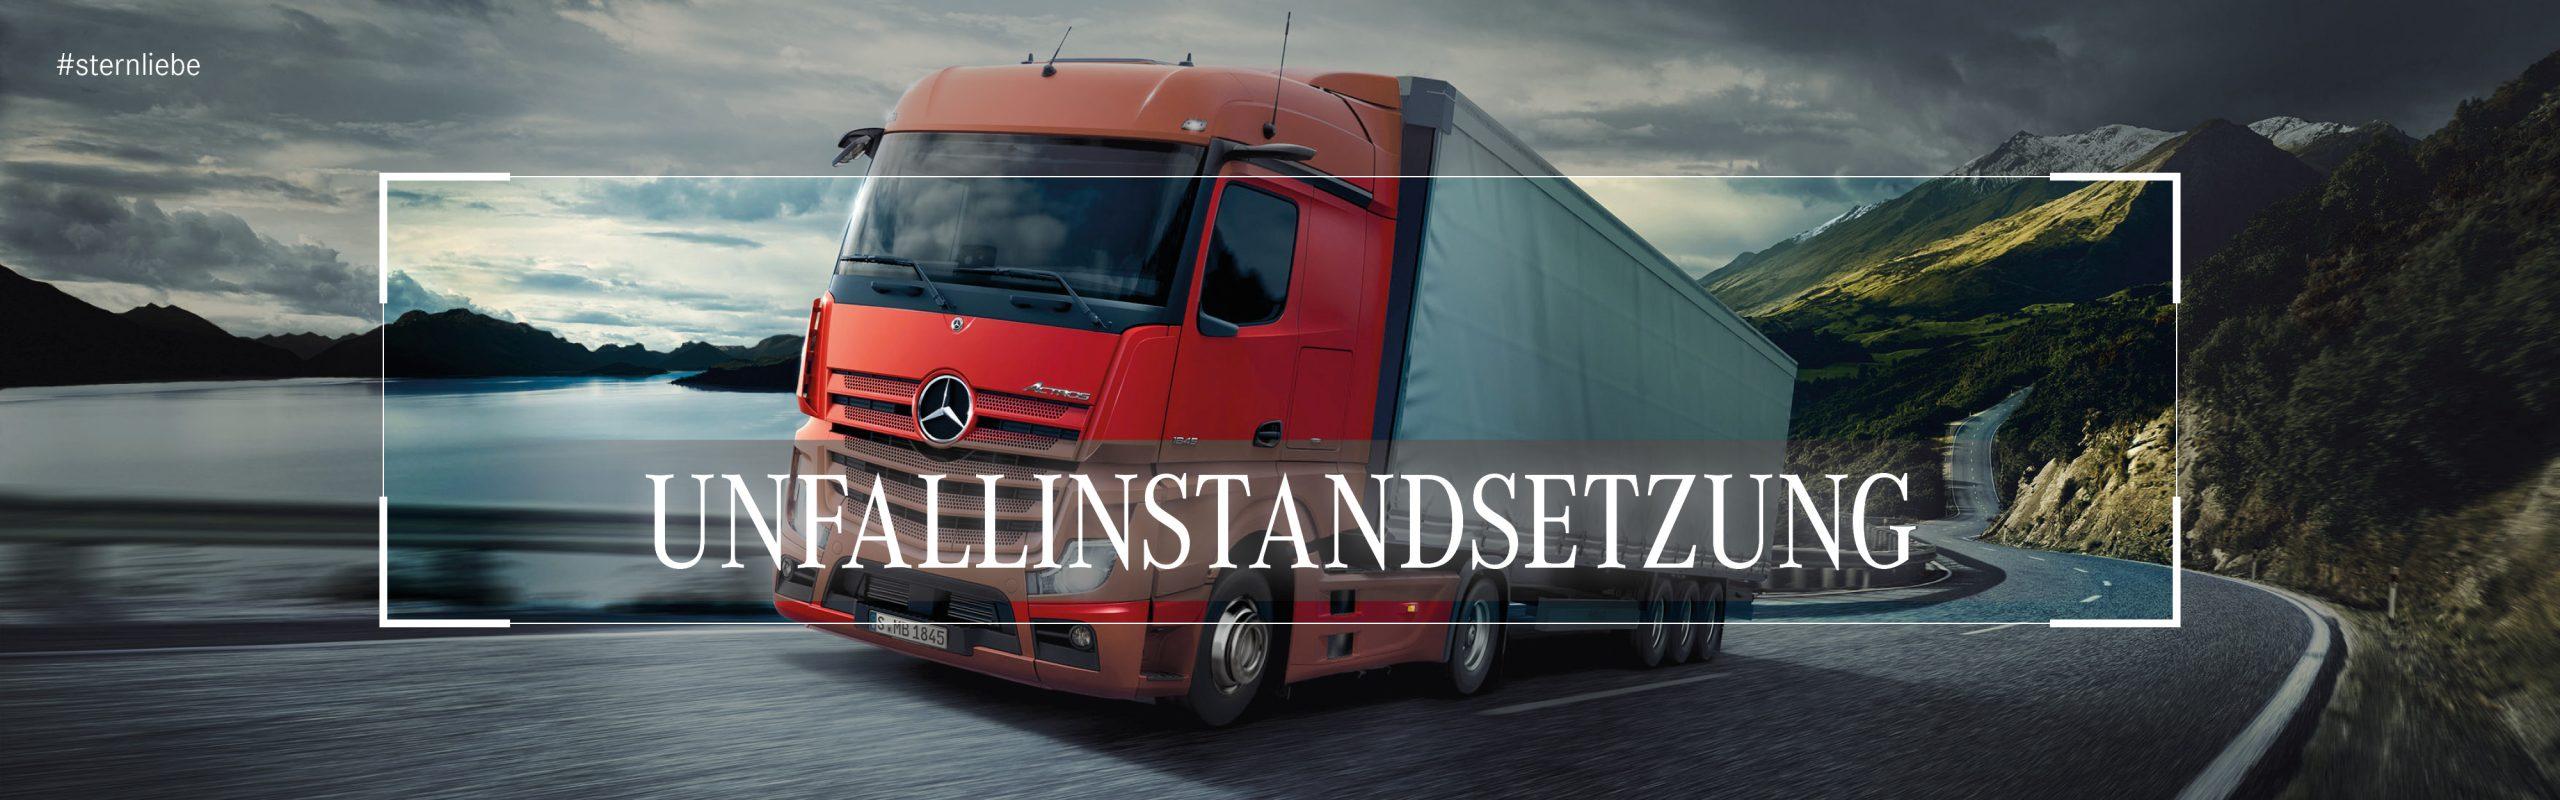 Mercedes-Brinkmann-Unfallinstandsetzung